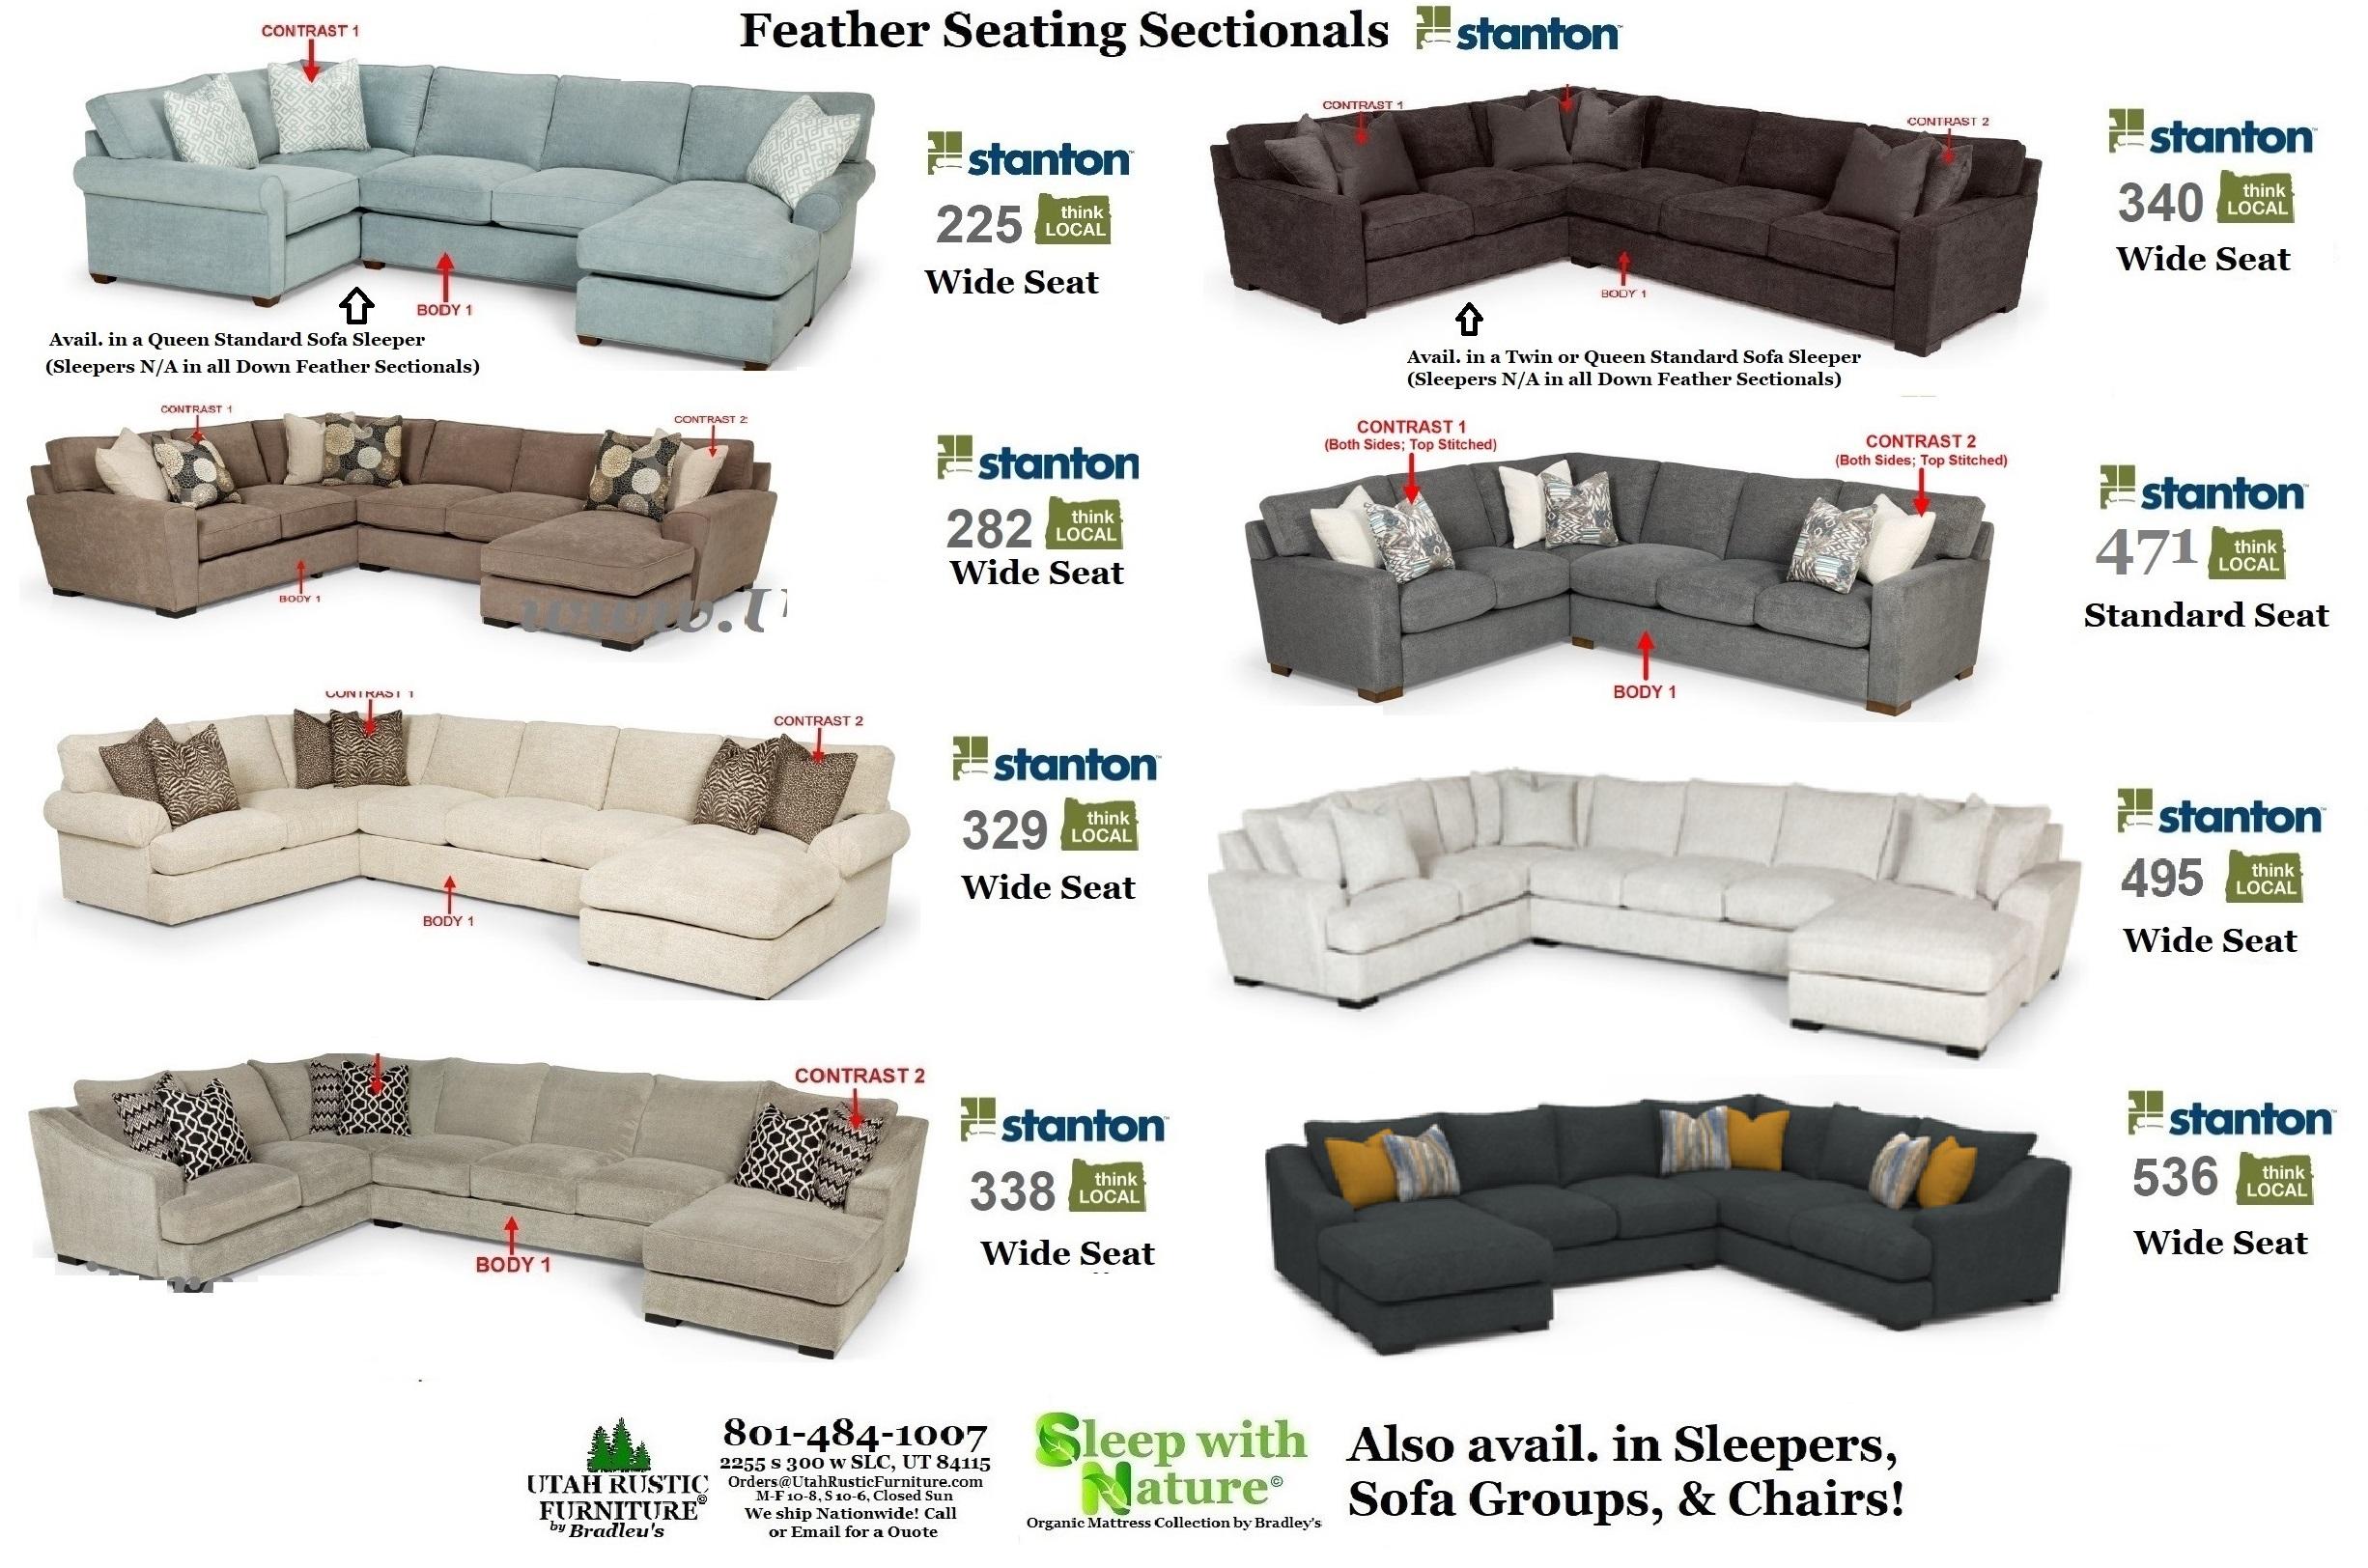 Terrific Bradleys Furniture Etc Stanton Fabric And Leather Sofas Interior Design Ideas Clesiryabchikinfo